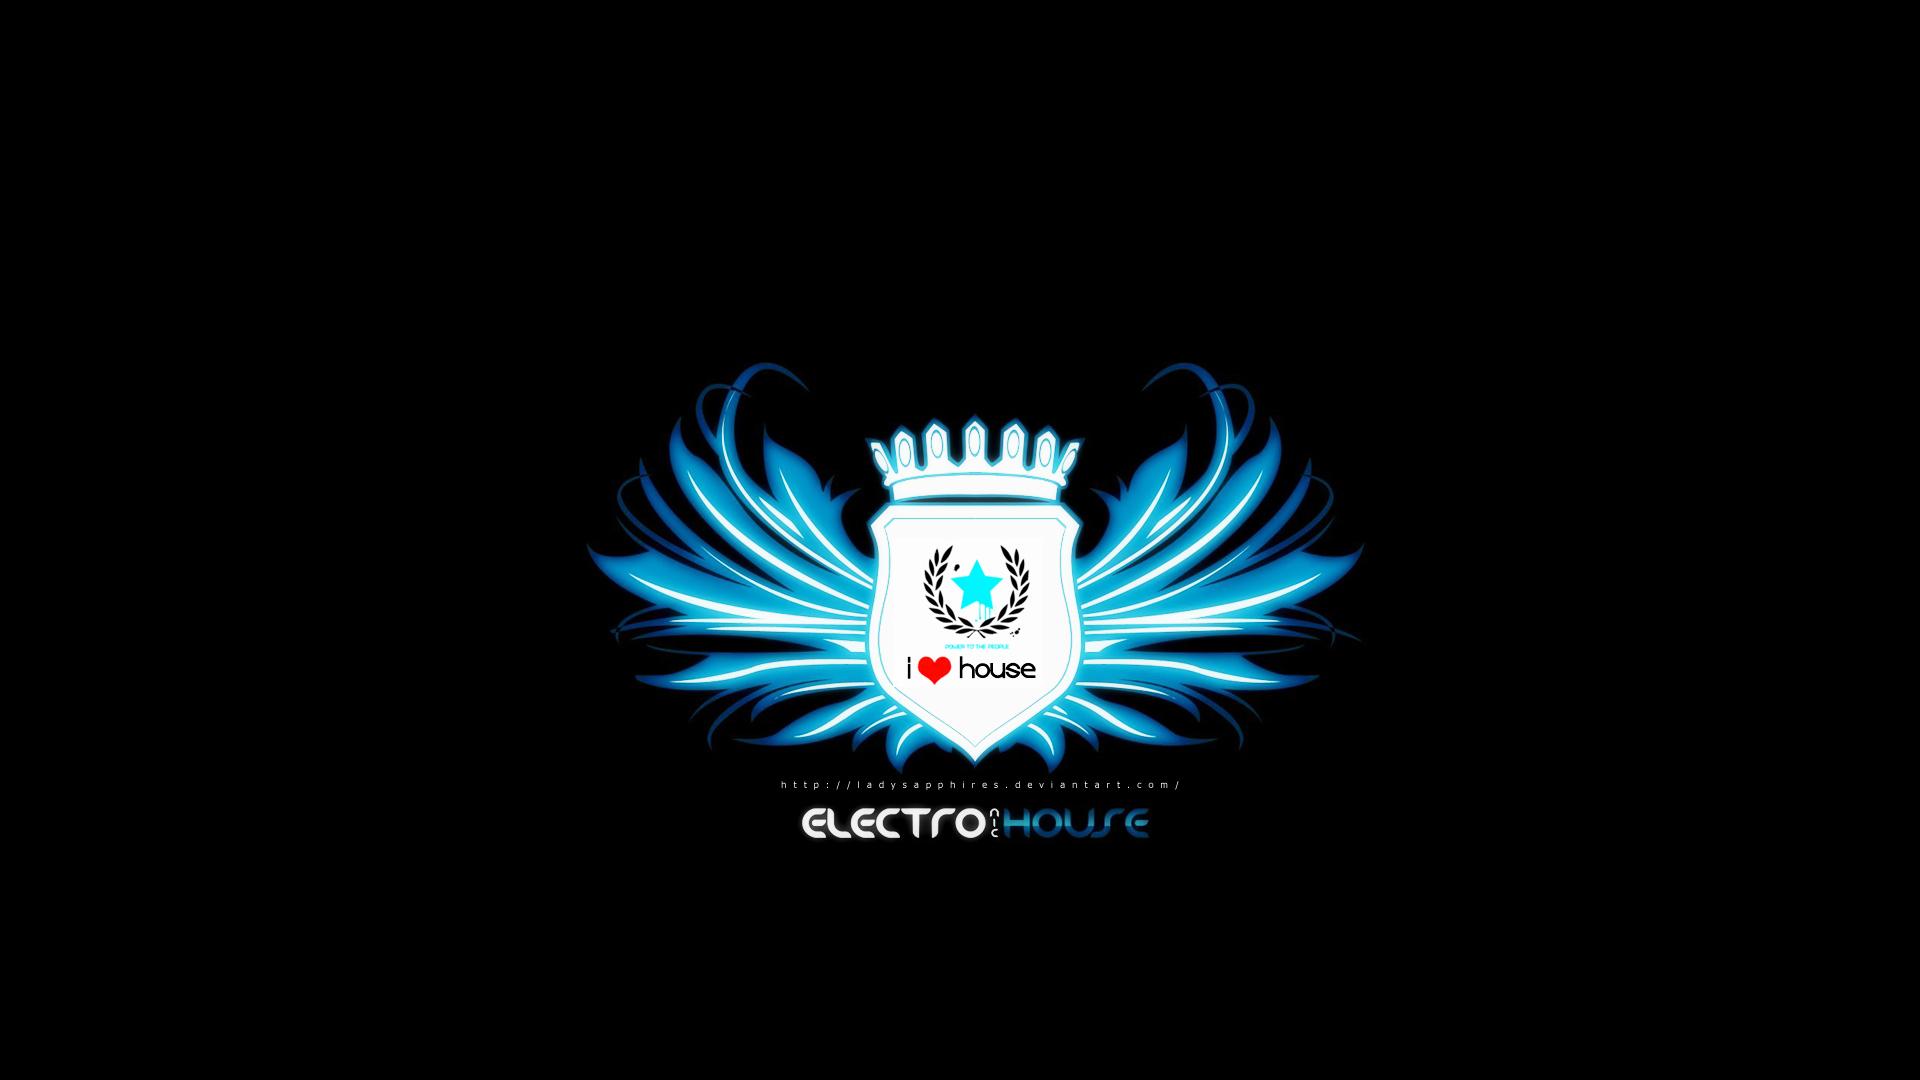 Electro music wallpaper 161194 for House music art